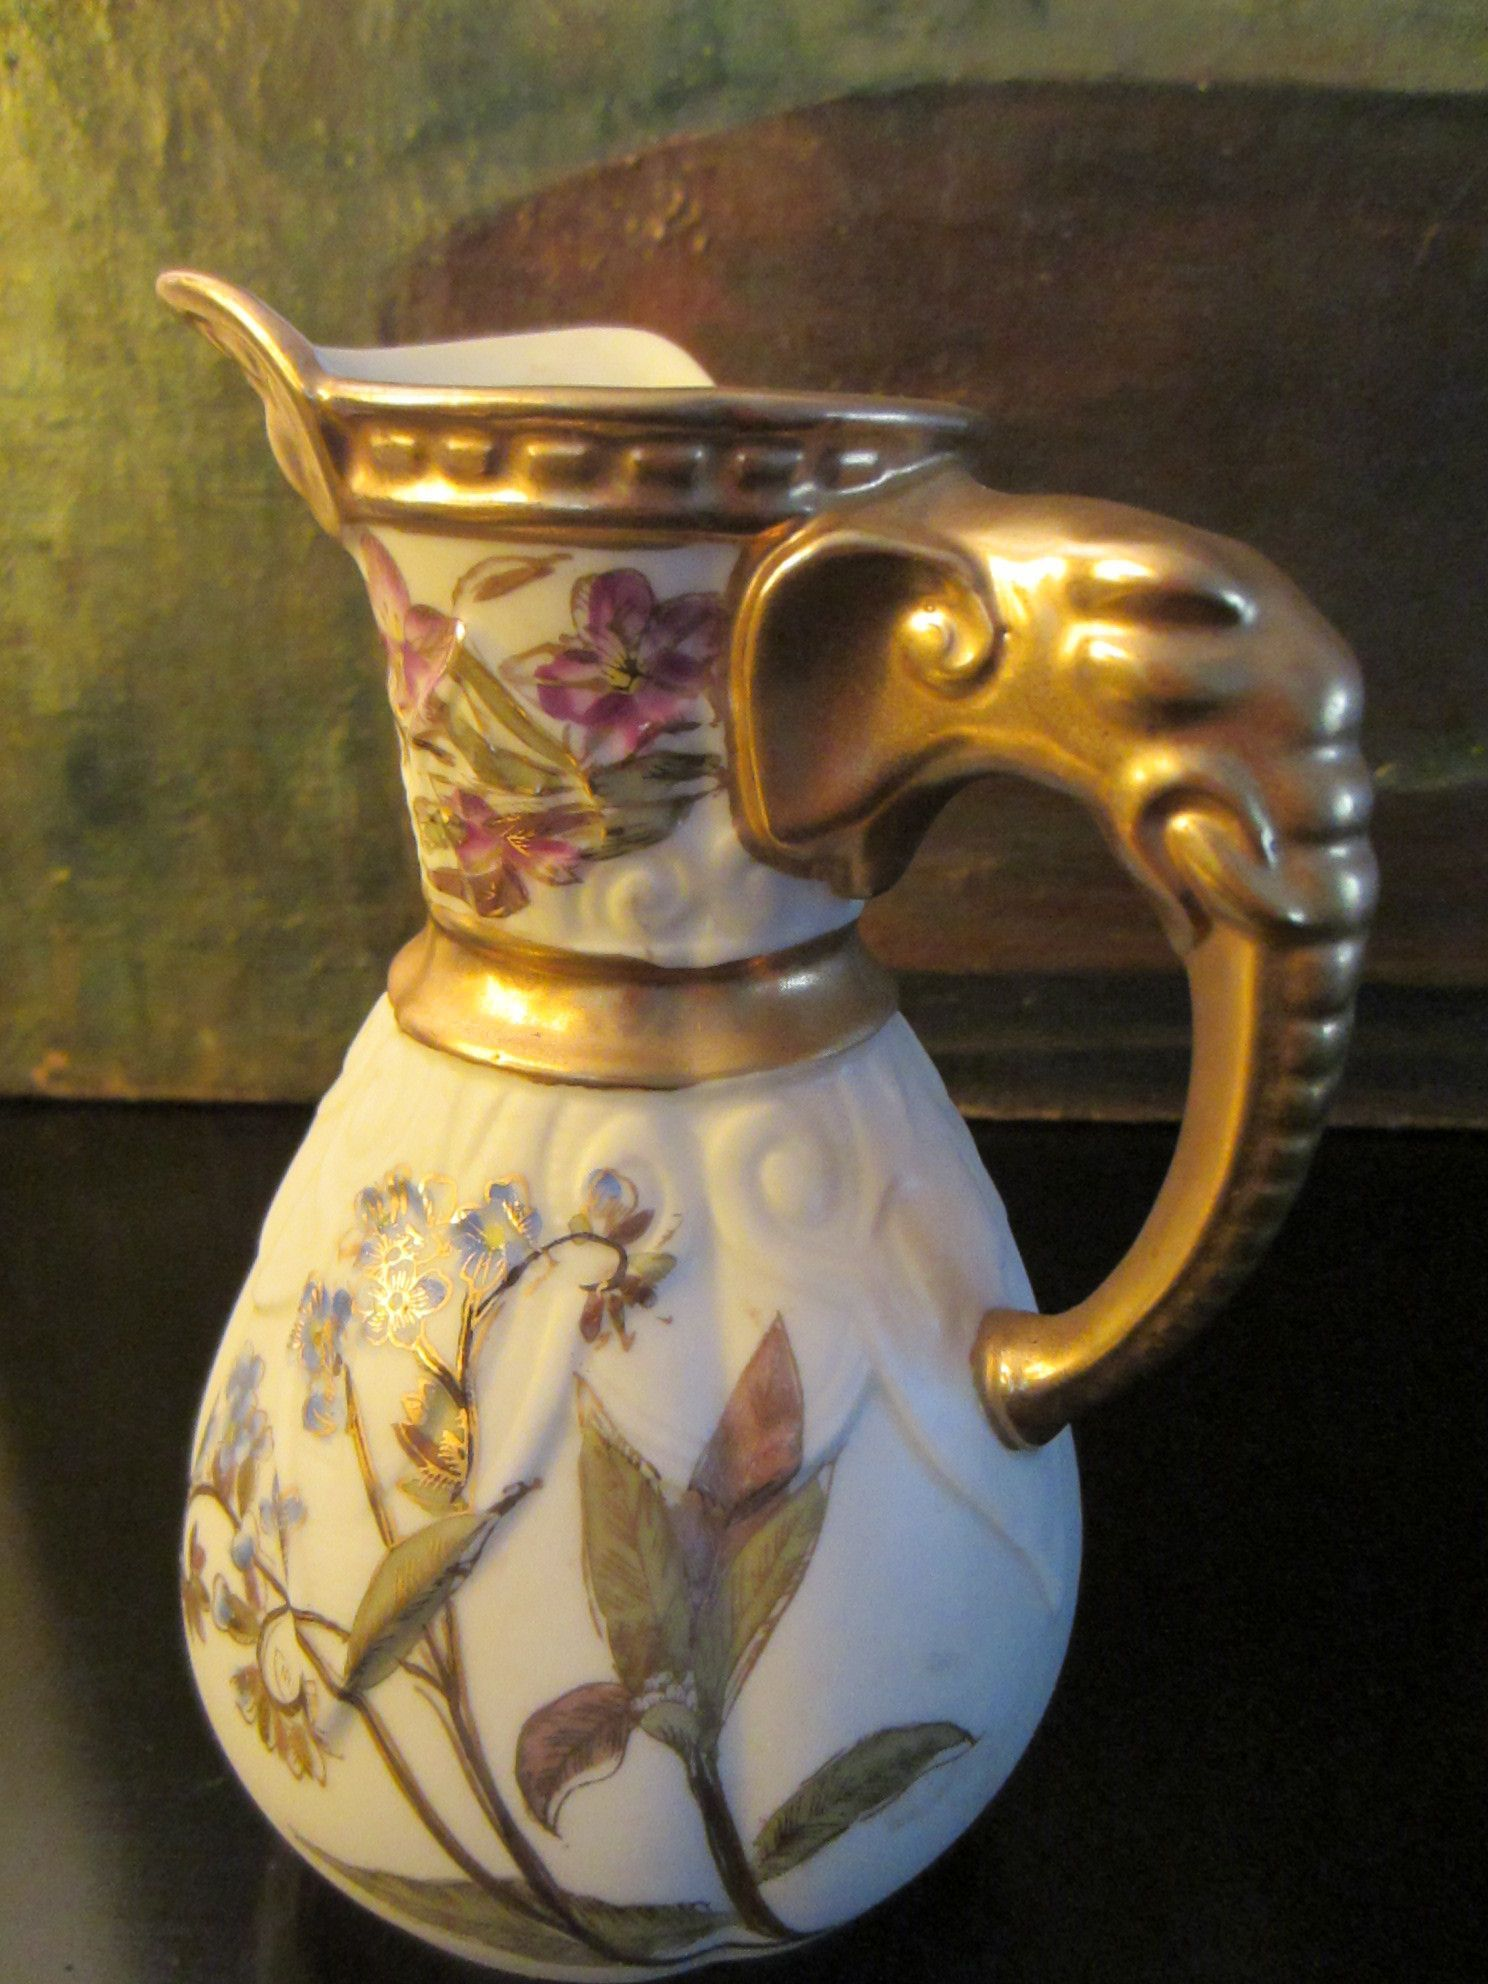 Royal Worcester Jug Antique Pitcher Hand Painted Porcelain Elephant Gold Handle